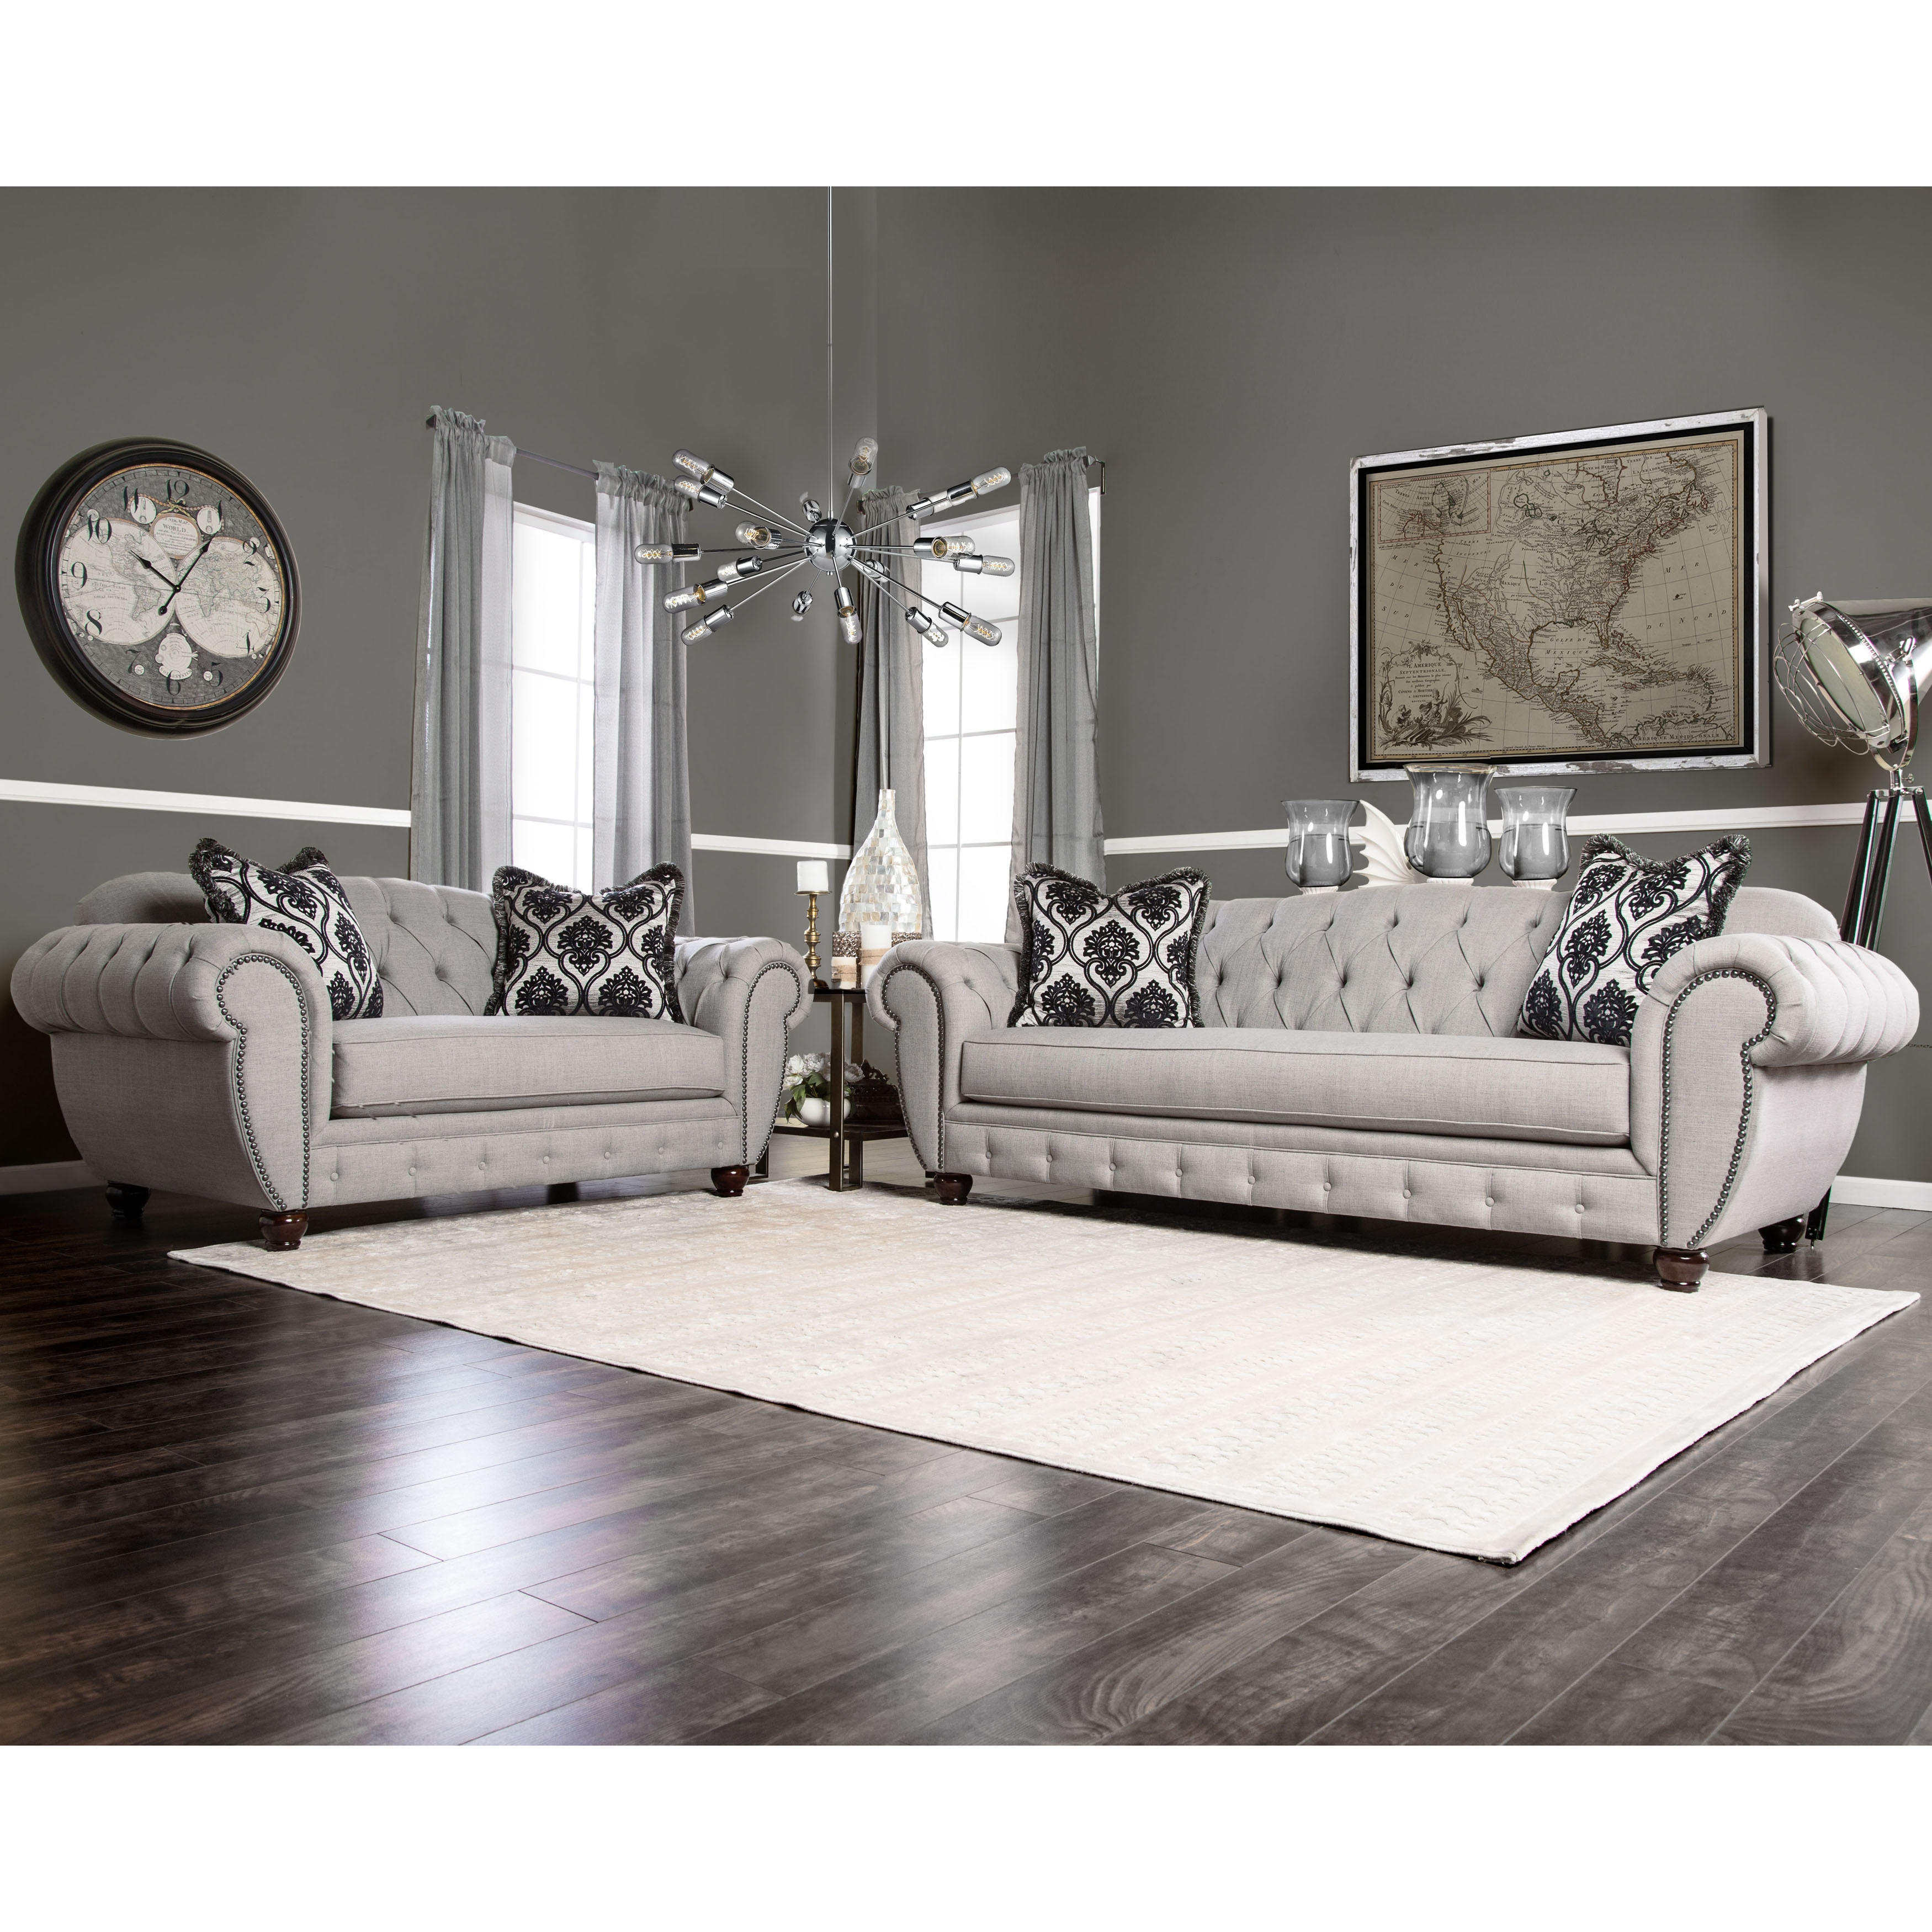 Shop Furniture of America Augusta Victorian Grey 2-piece Sofa Set ...